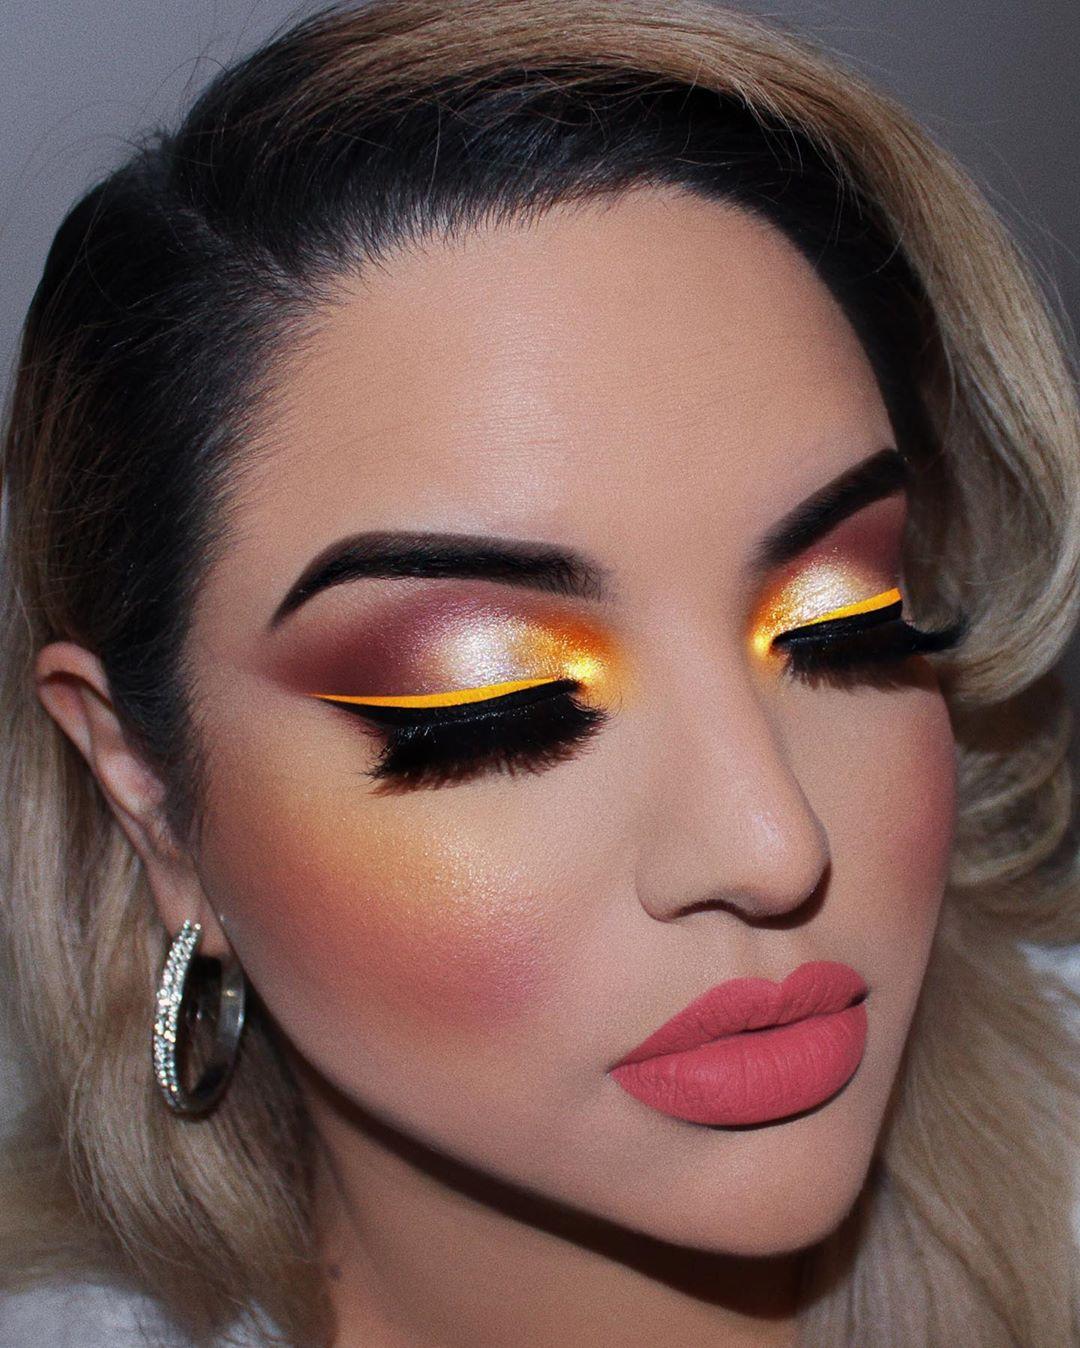 Maquiagem sombra colorida carnaval